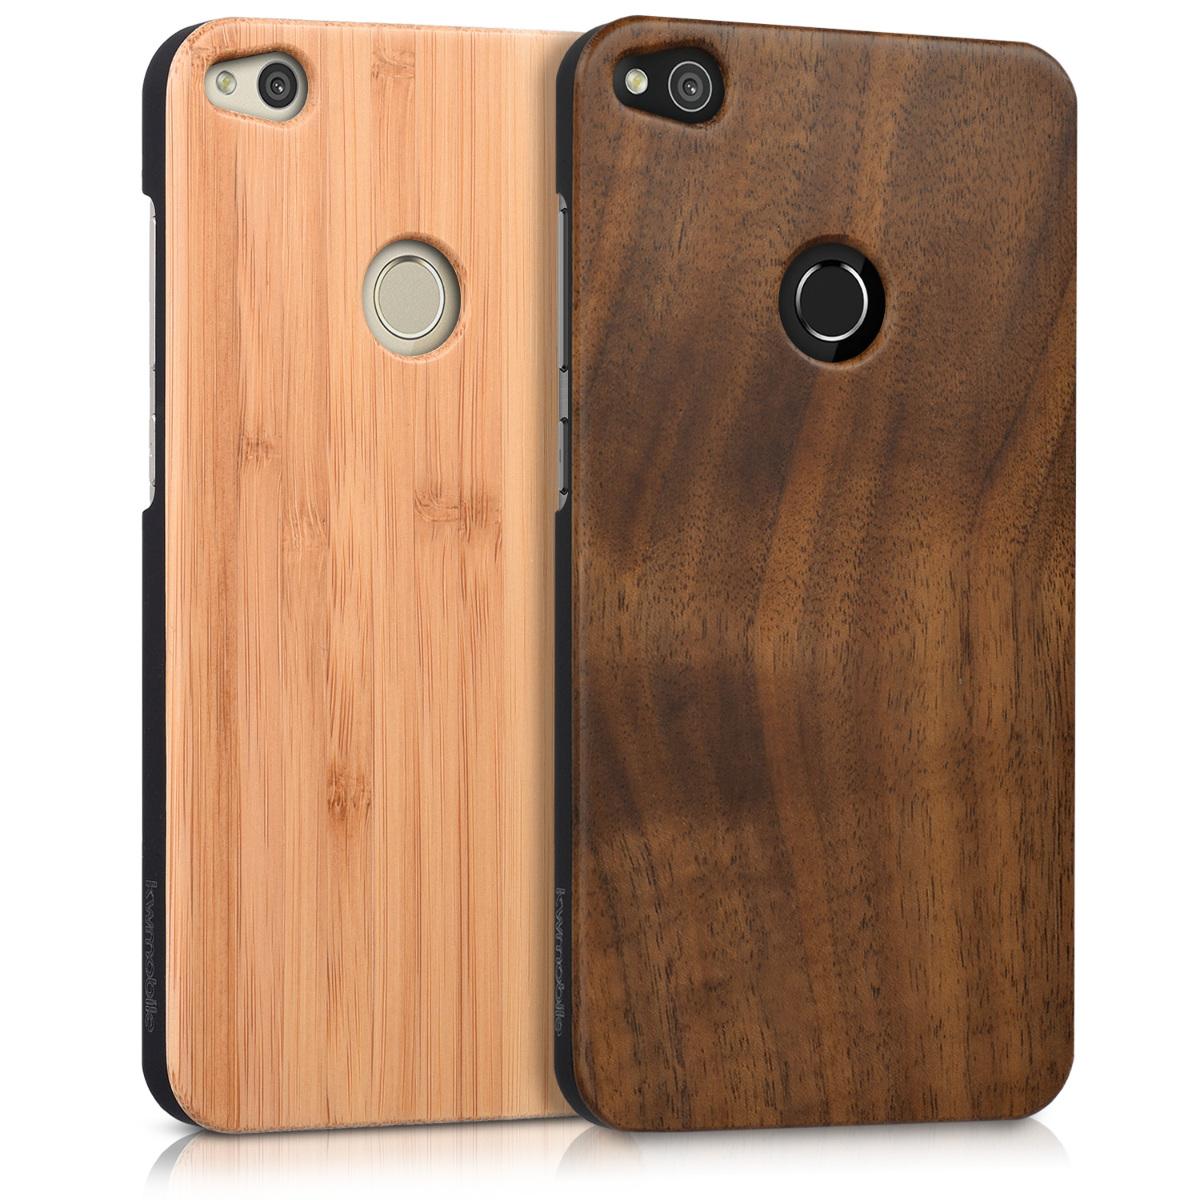 wooden case for huawei p8 lite 2017 protection cover mobile case glitter ebay. Black Bedroom Furniture Sets. Home Design Ideas